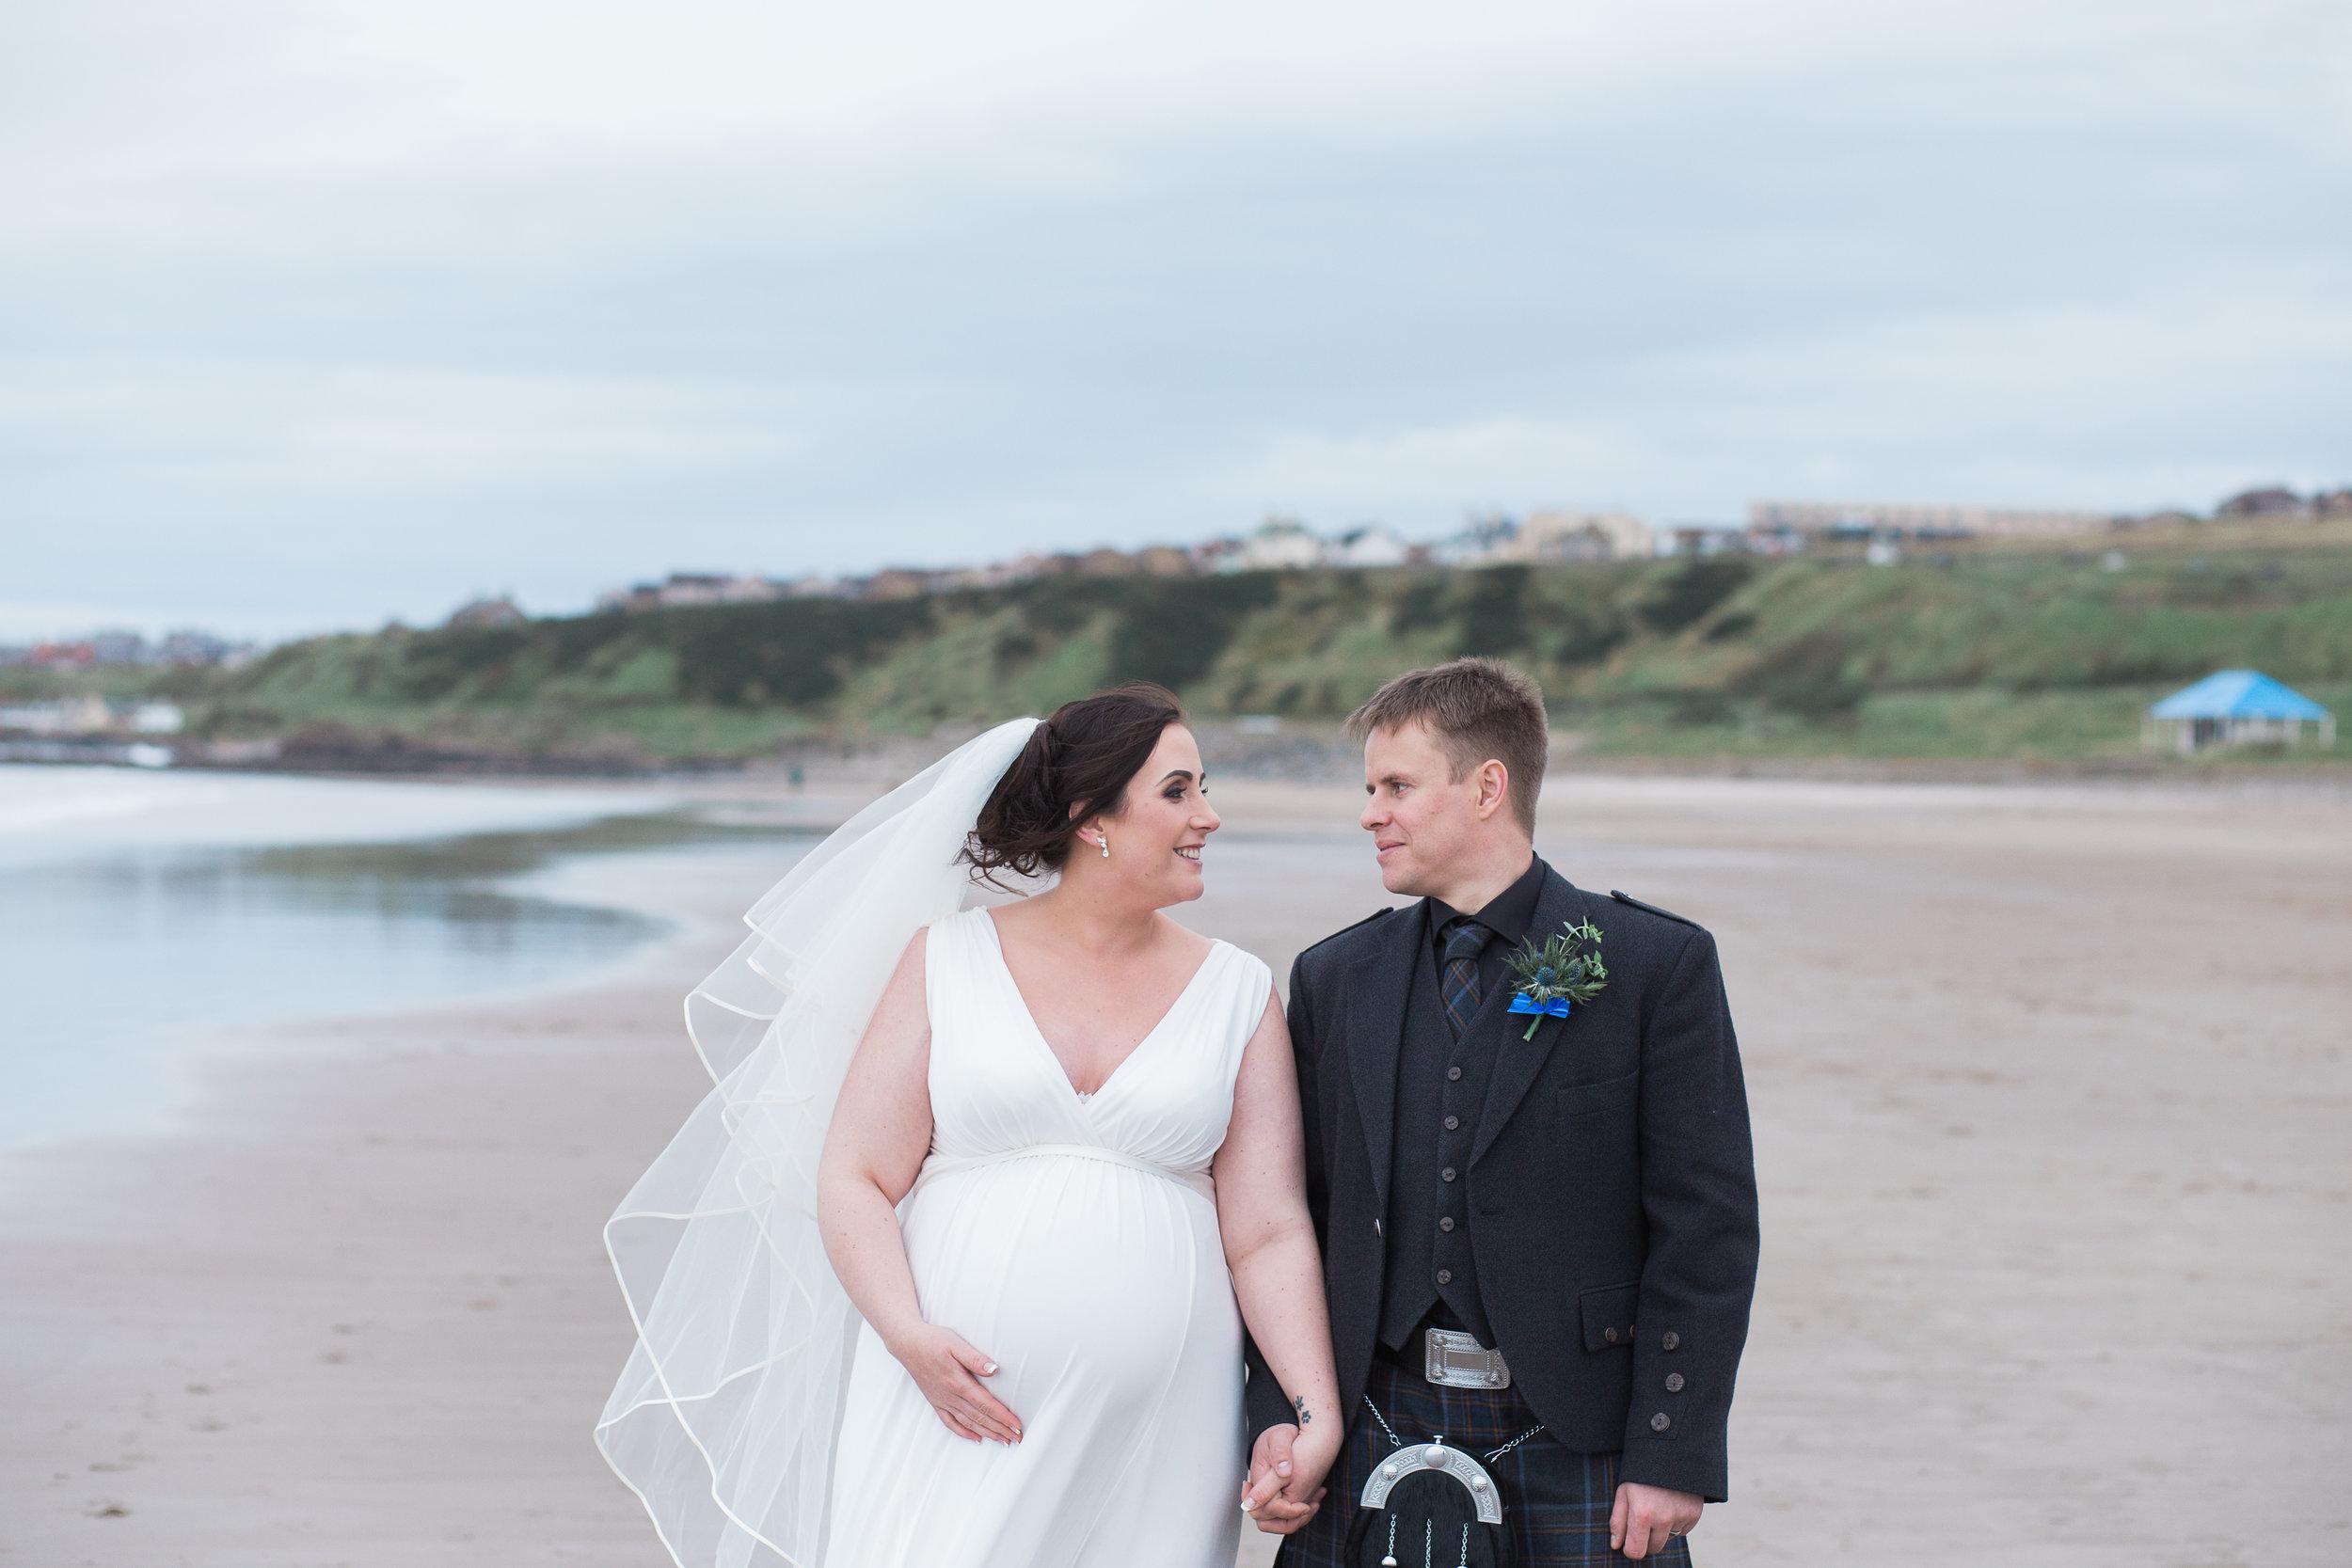 beach wedding Aberdeenshire, Banff springs hotel, Aberdeenshire wedding photography, Scottish wedding photographer, natural wedding photography aberdeen, bride and groom